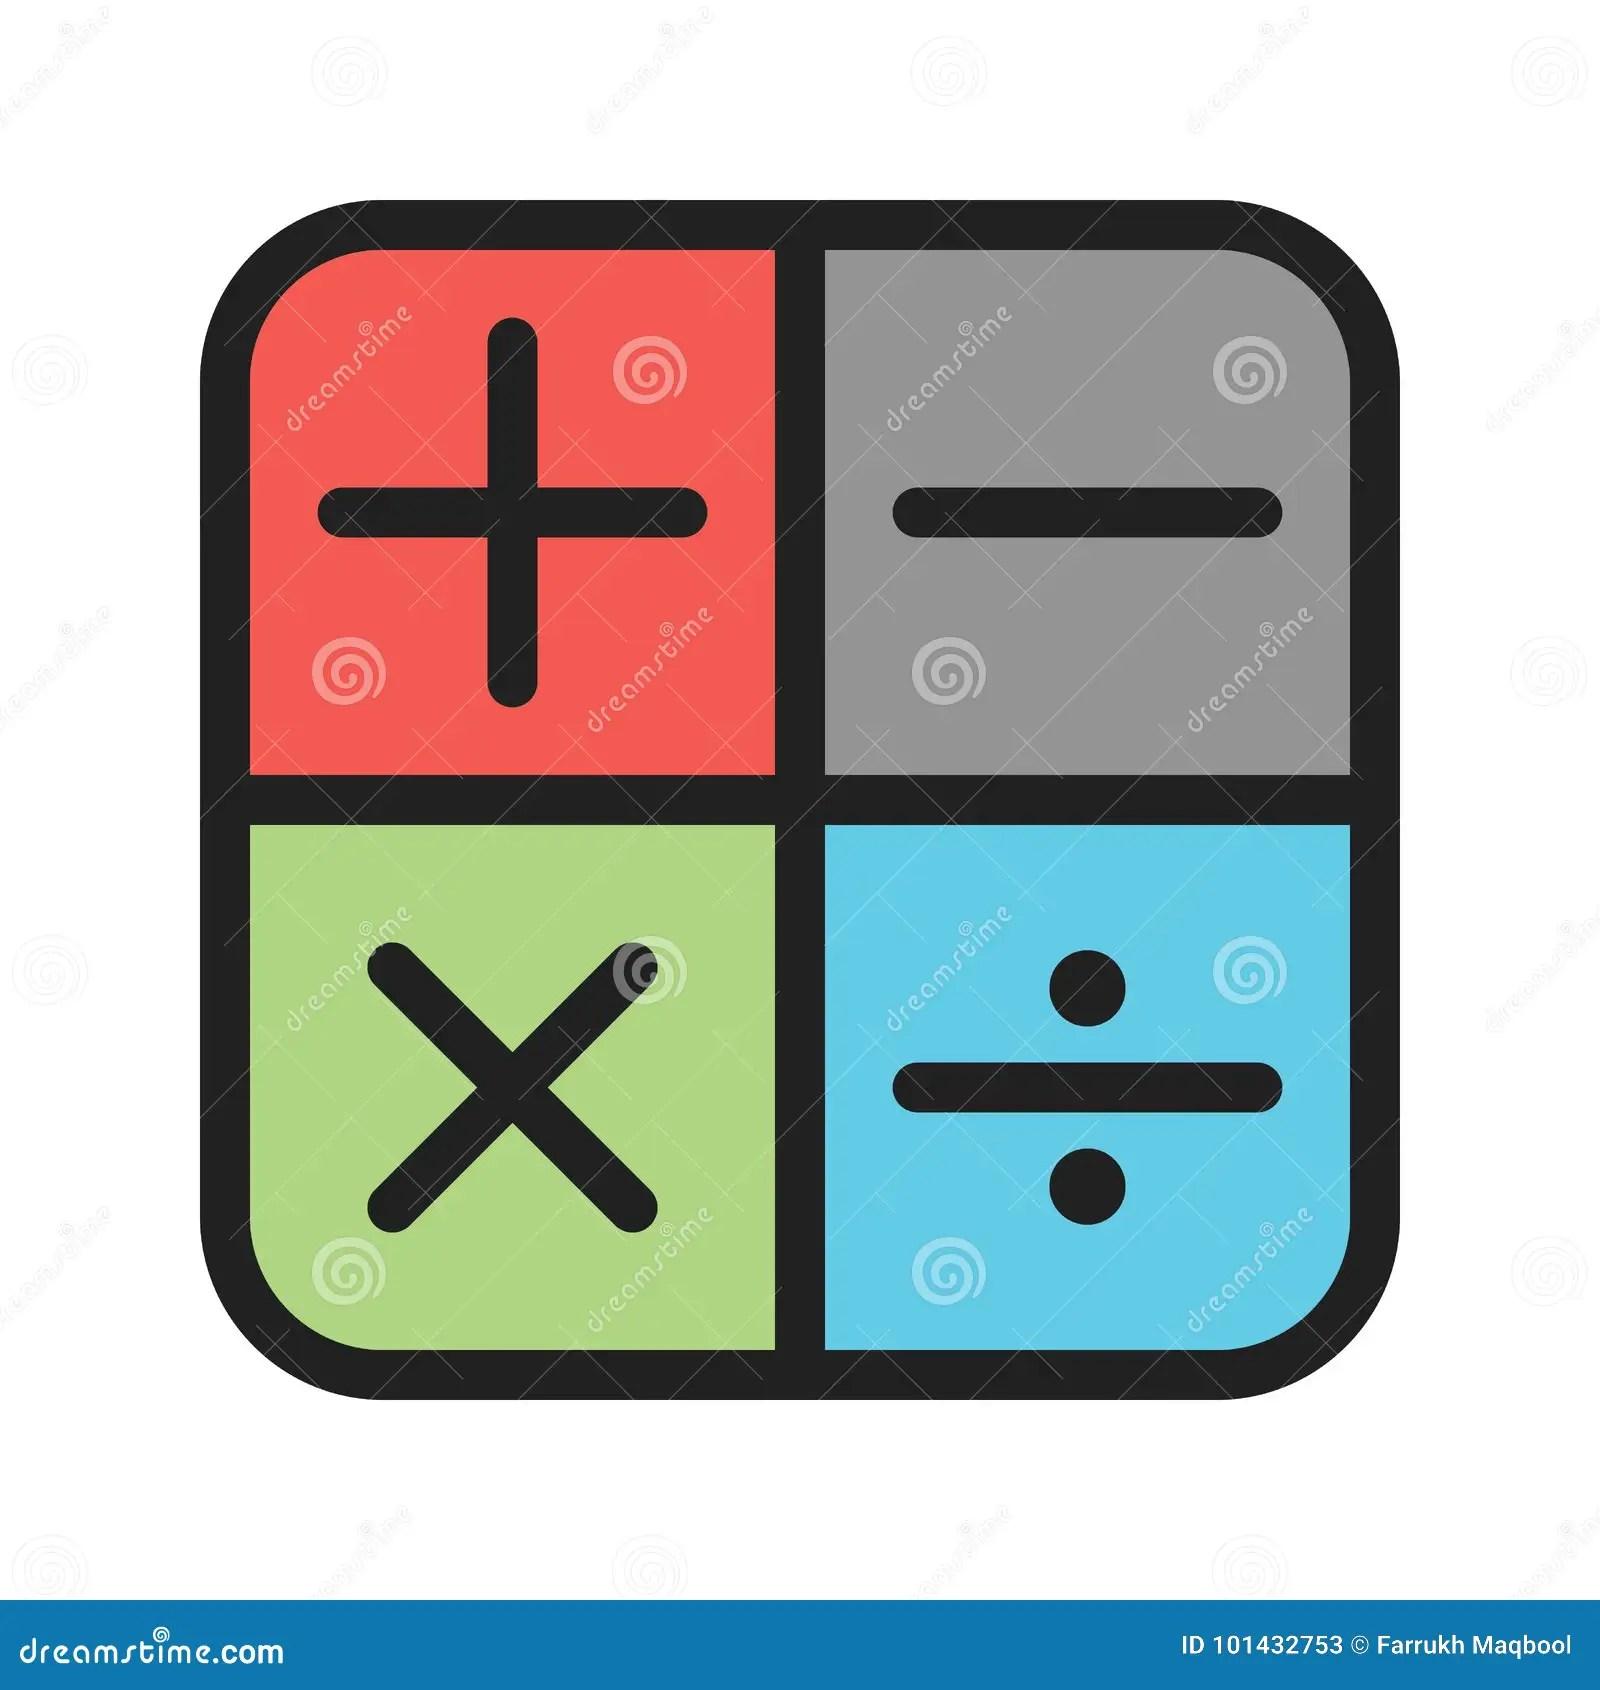 Latest Hd Symbols In Math